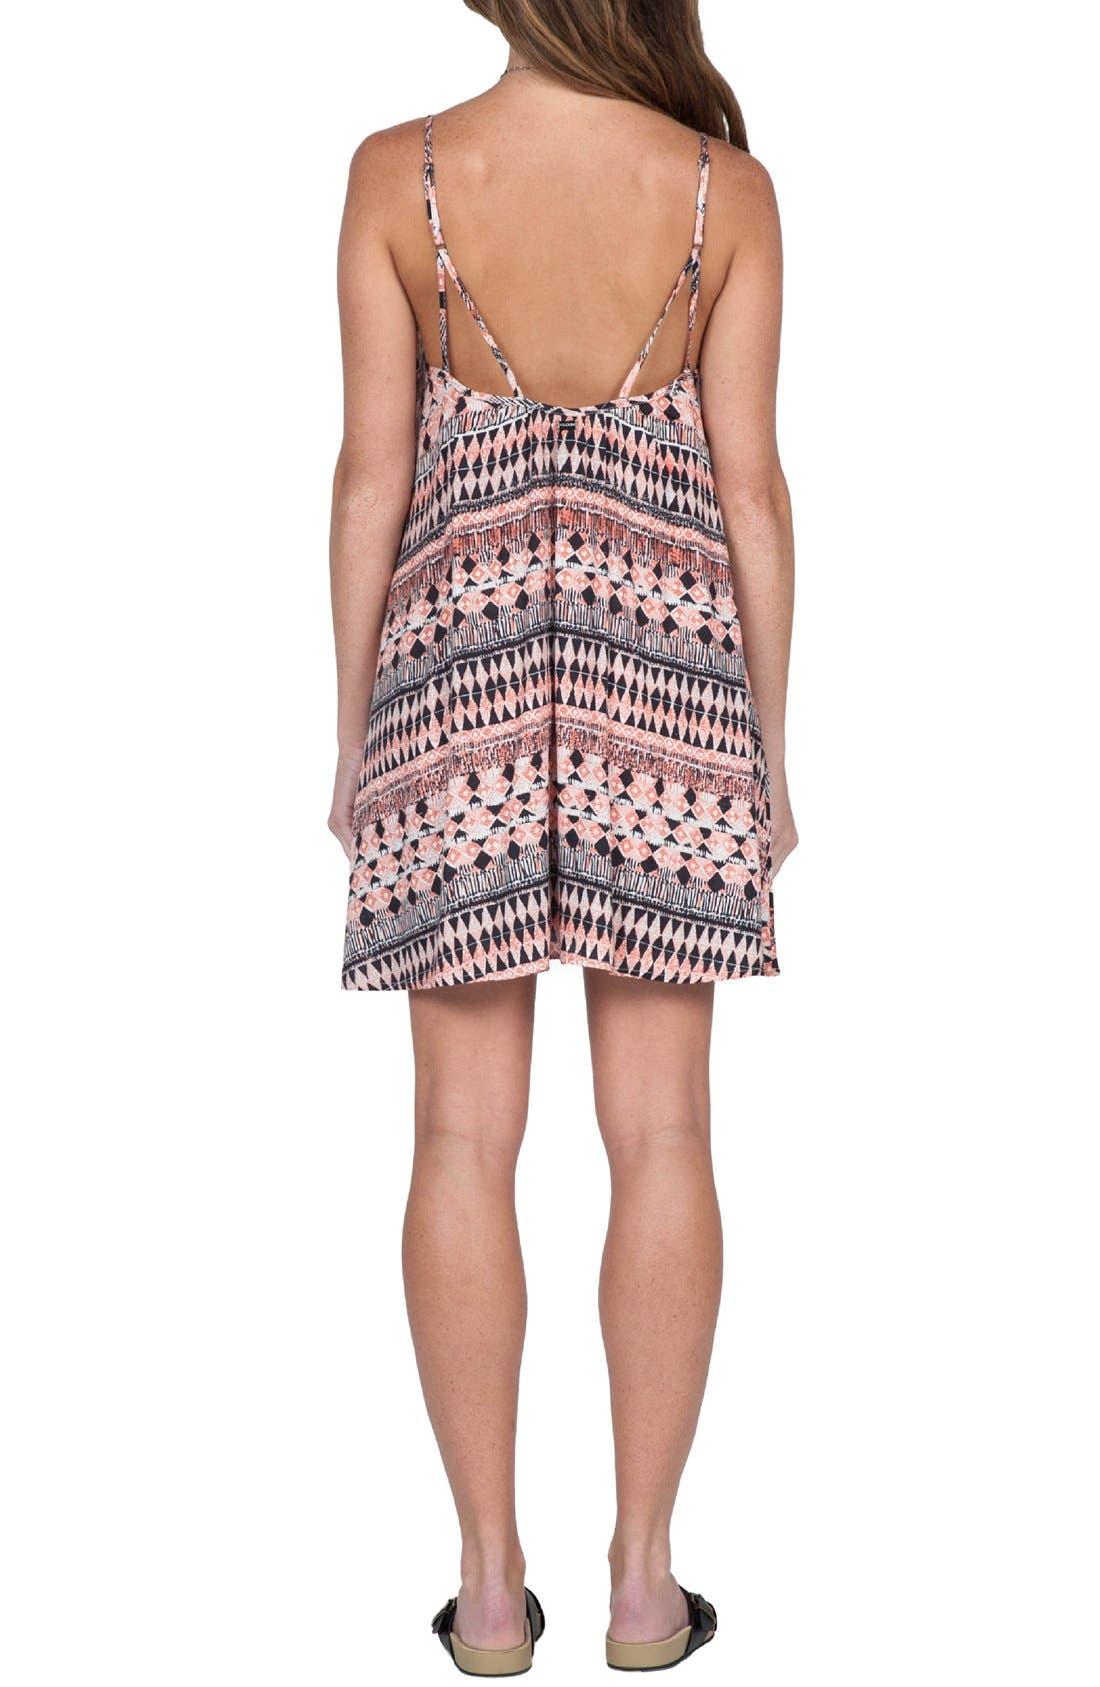 Alternate Image 2  - Volcom 'Back For U' Print Camisole Dress